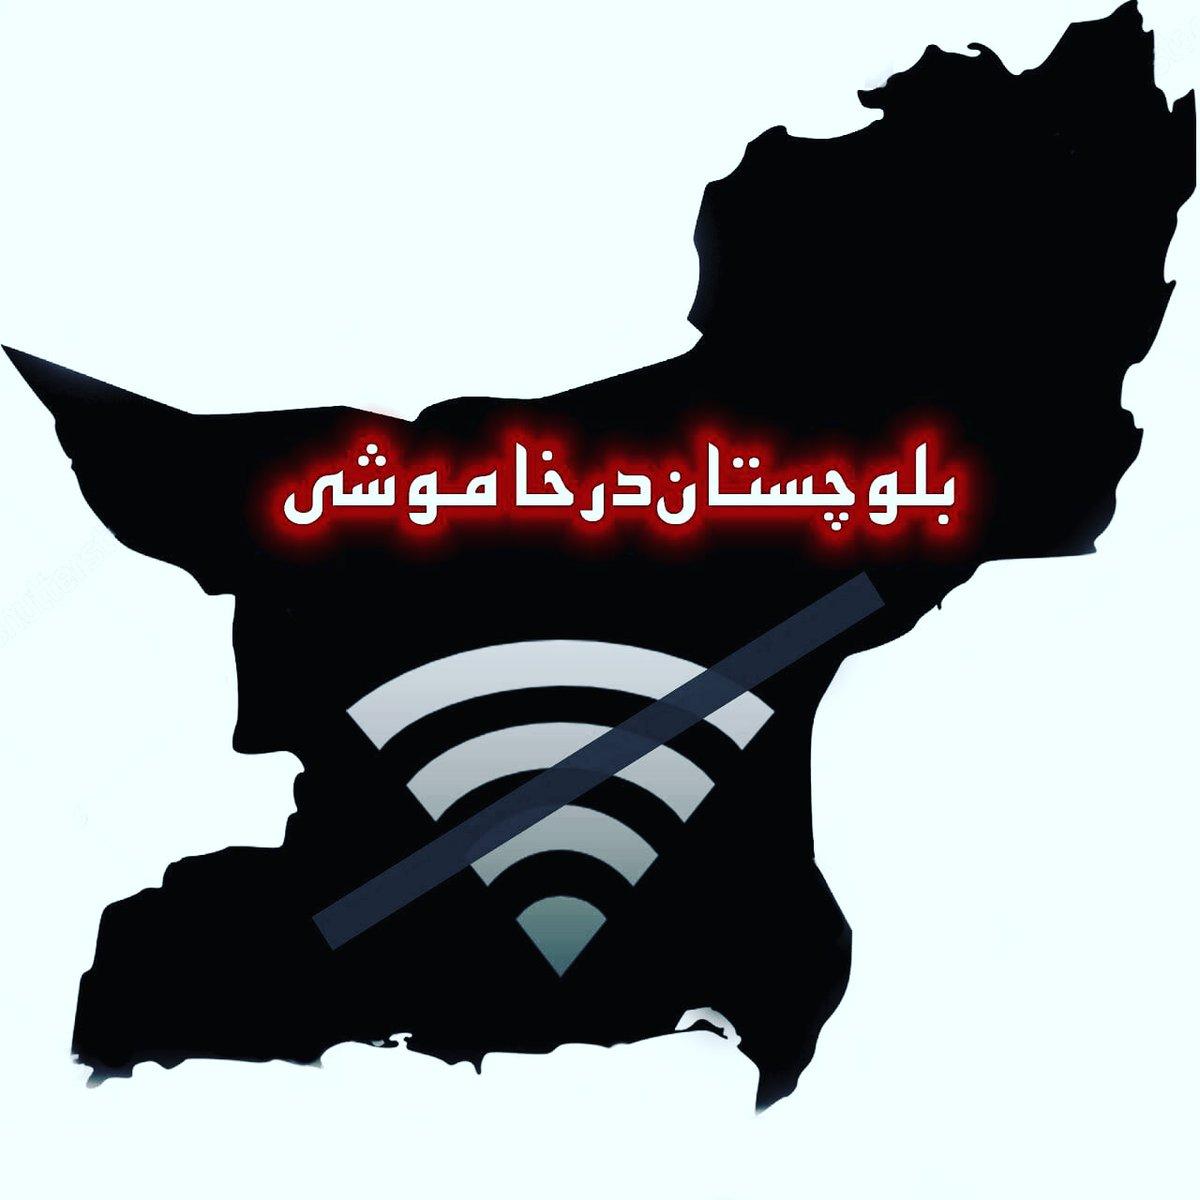 #Iran